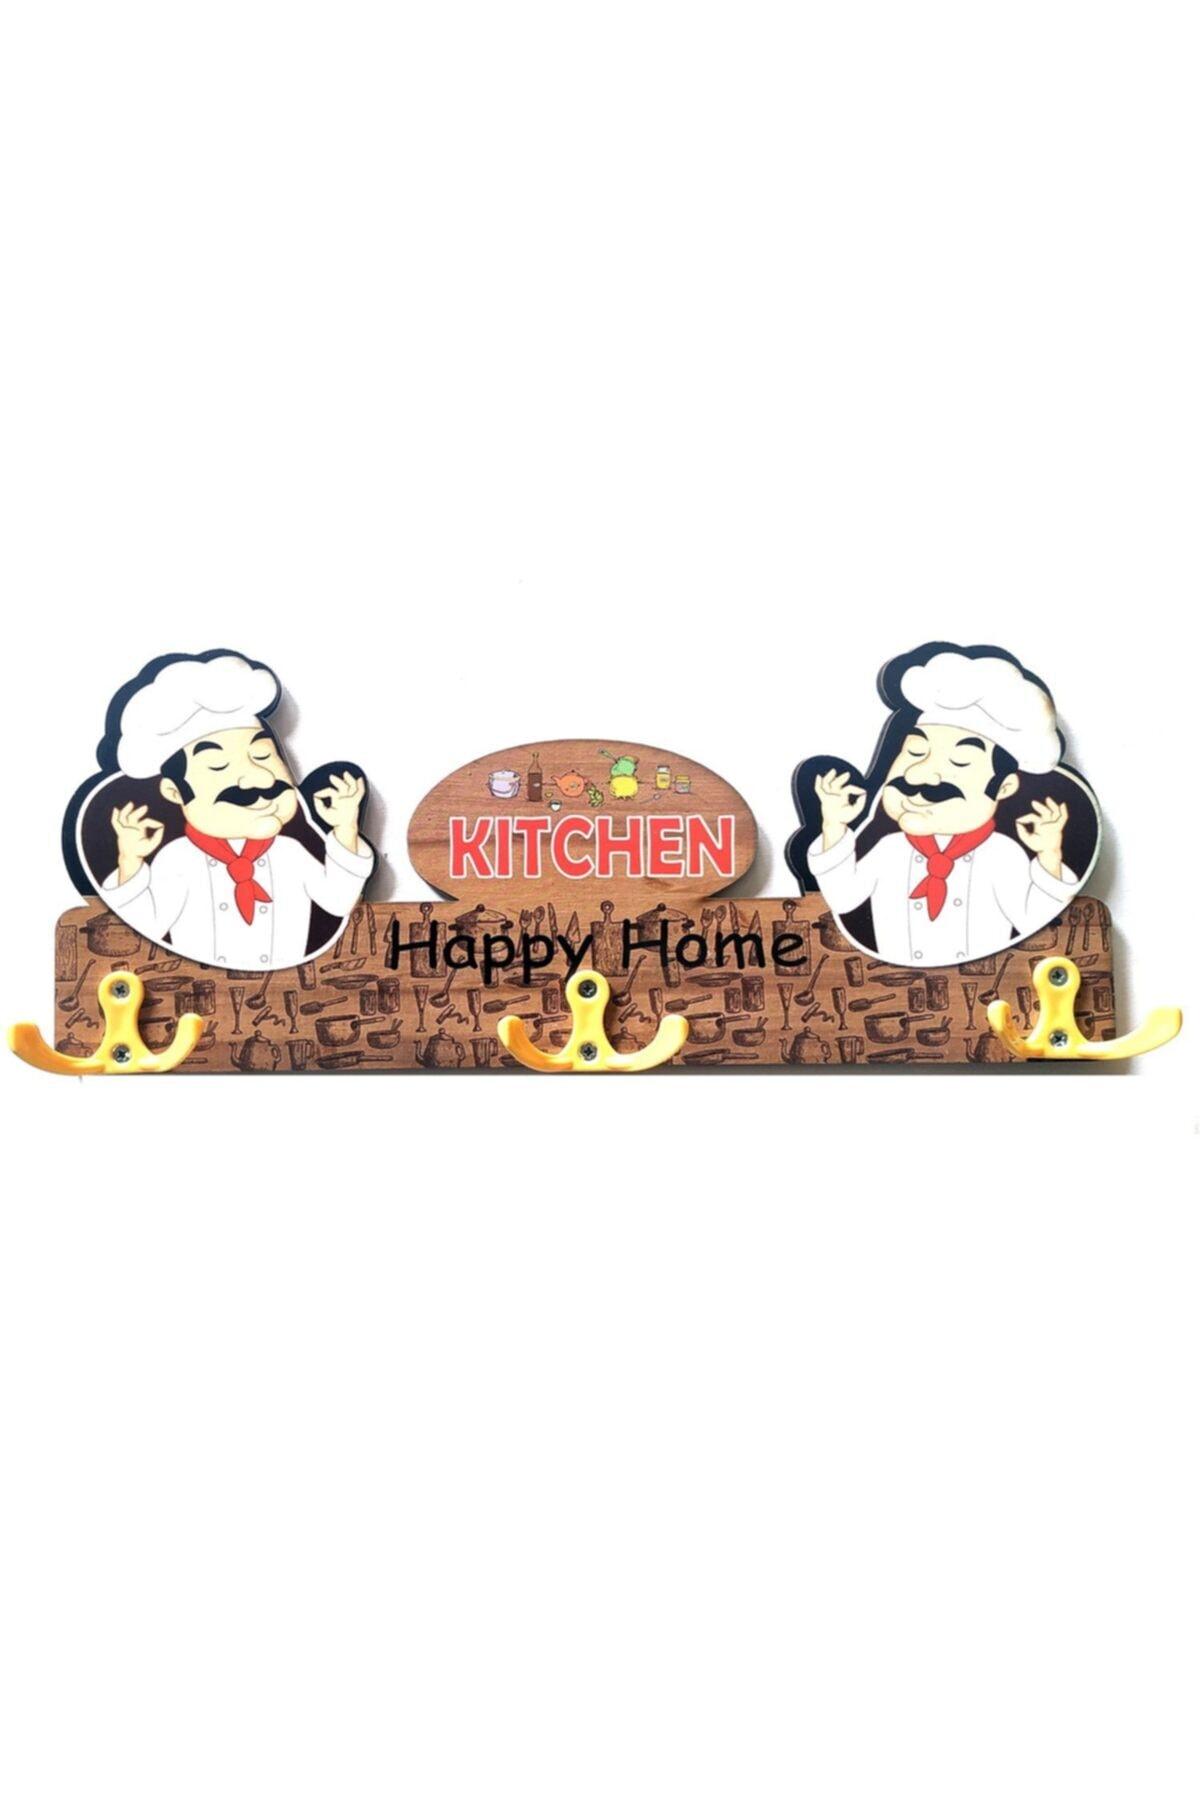 Transformacion Kitchen Yapışkanlı Mutfak Askısı 713157 1